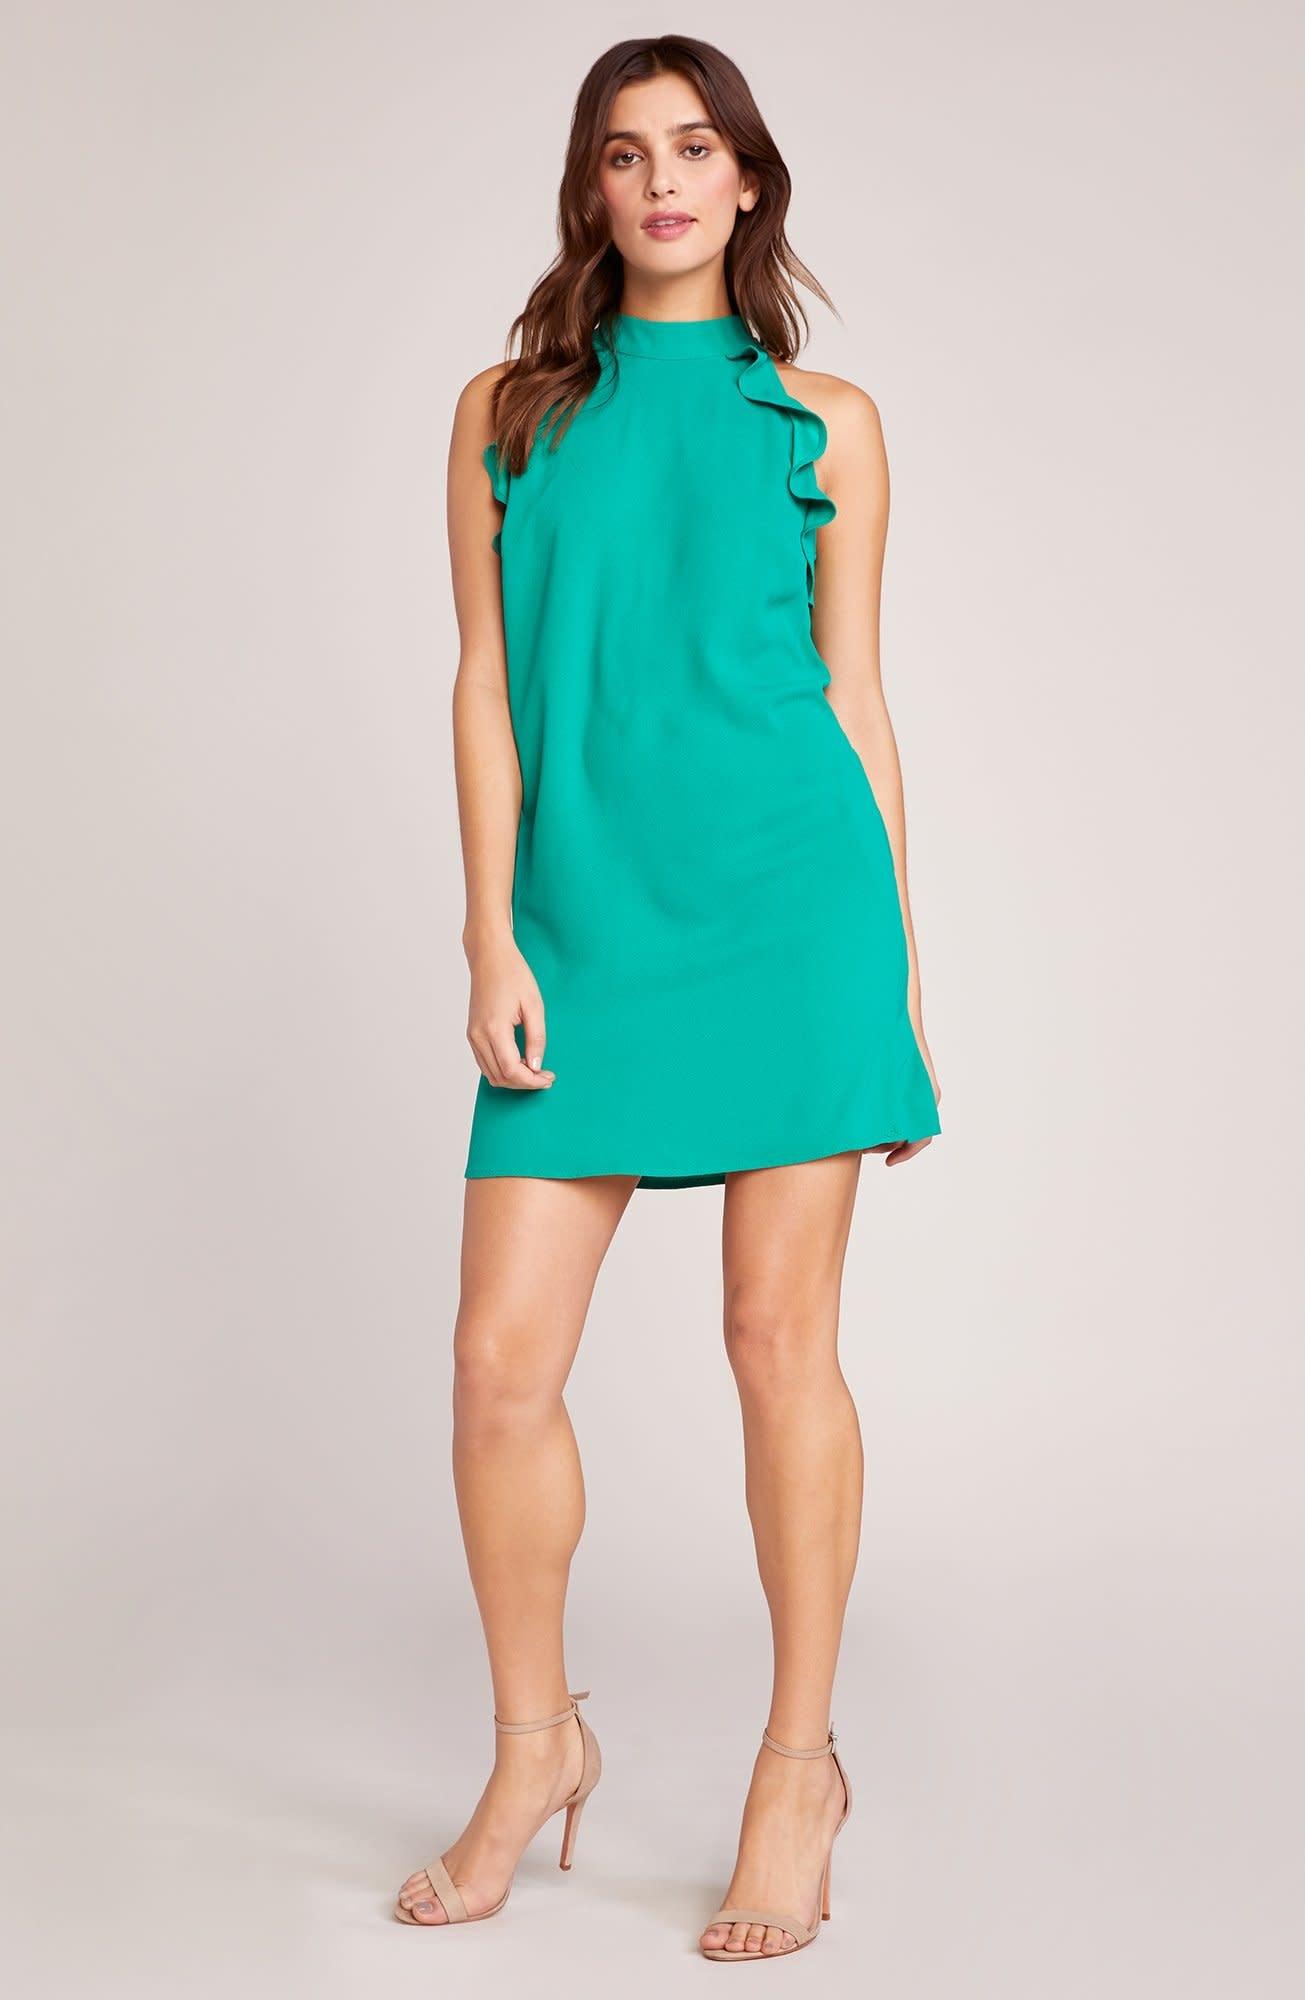 Jack by BB Dakota Necks Question Halter Dress